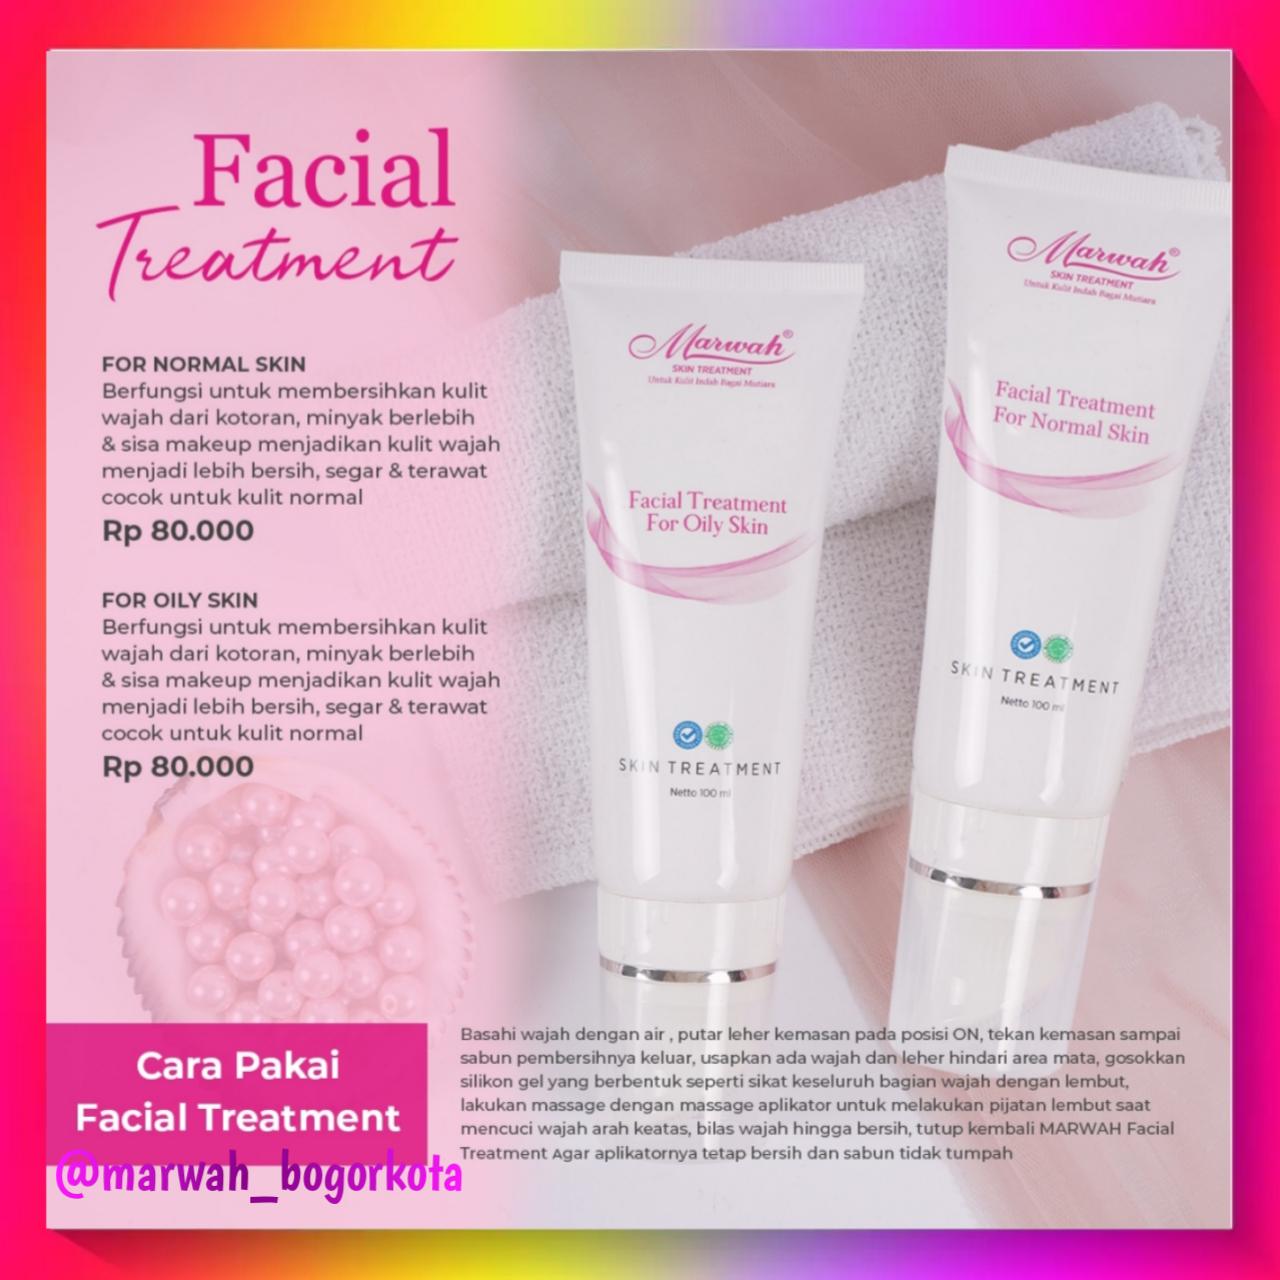 marwah facial treatment – membersihkan pori2- wajah menjahalus